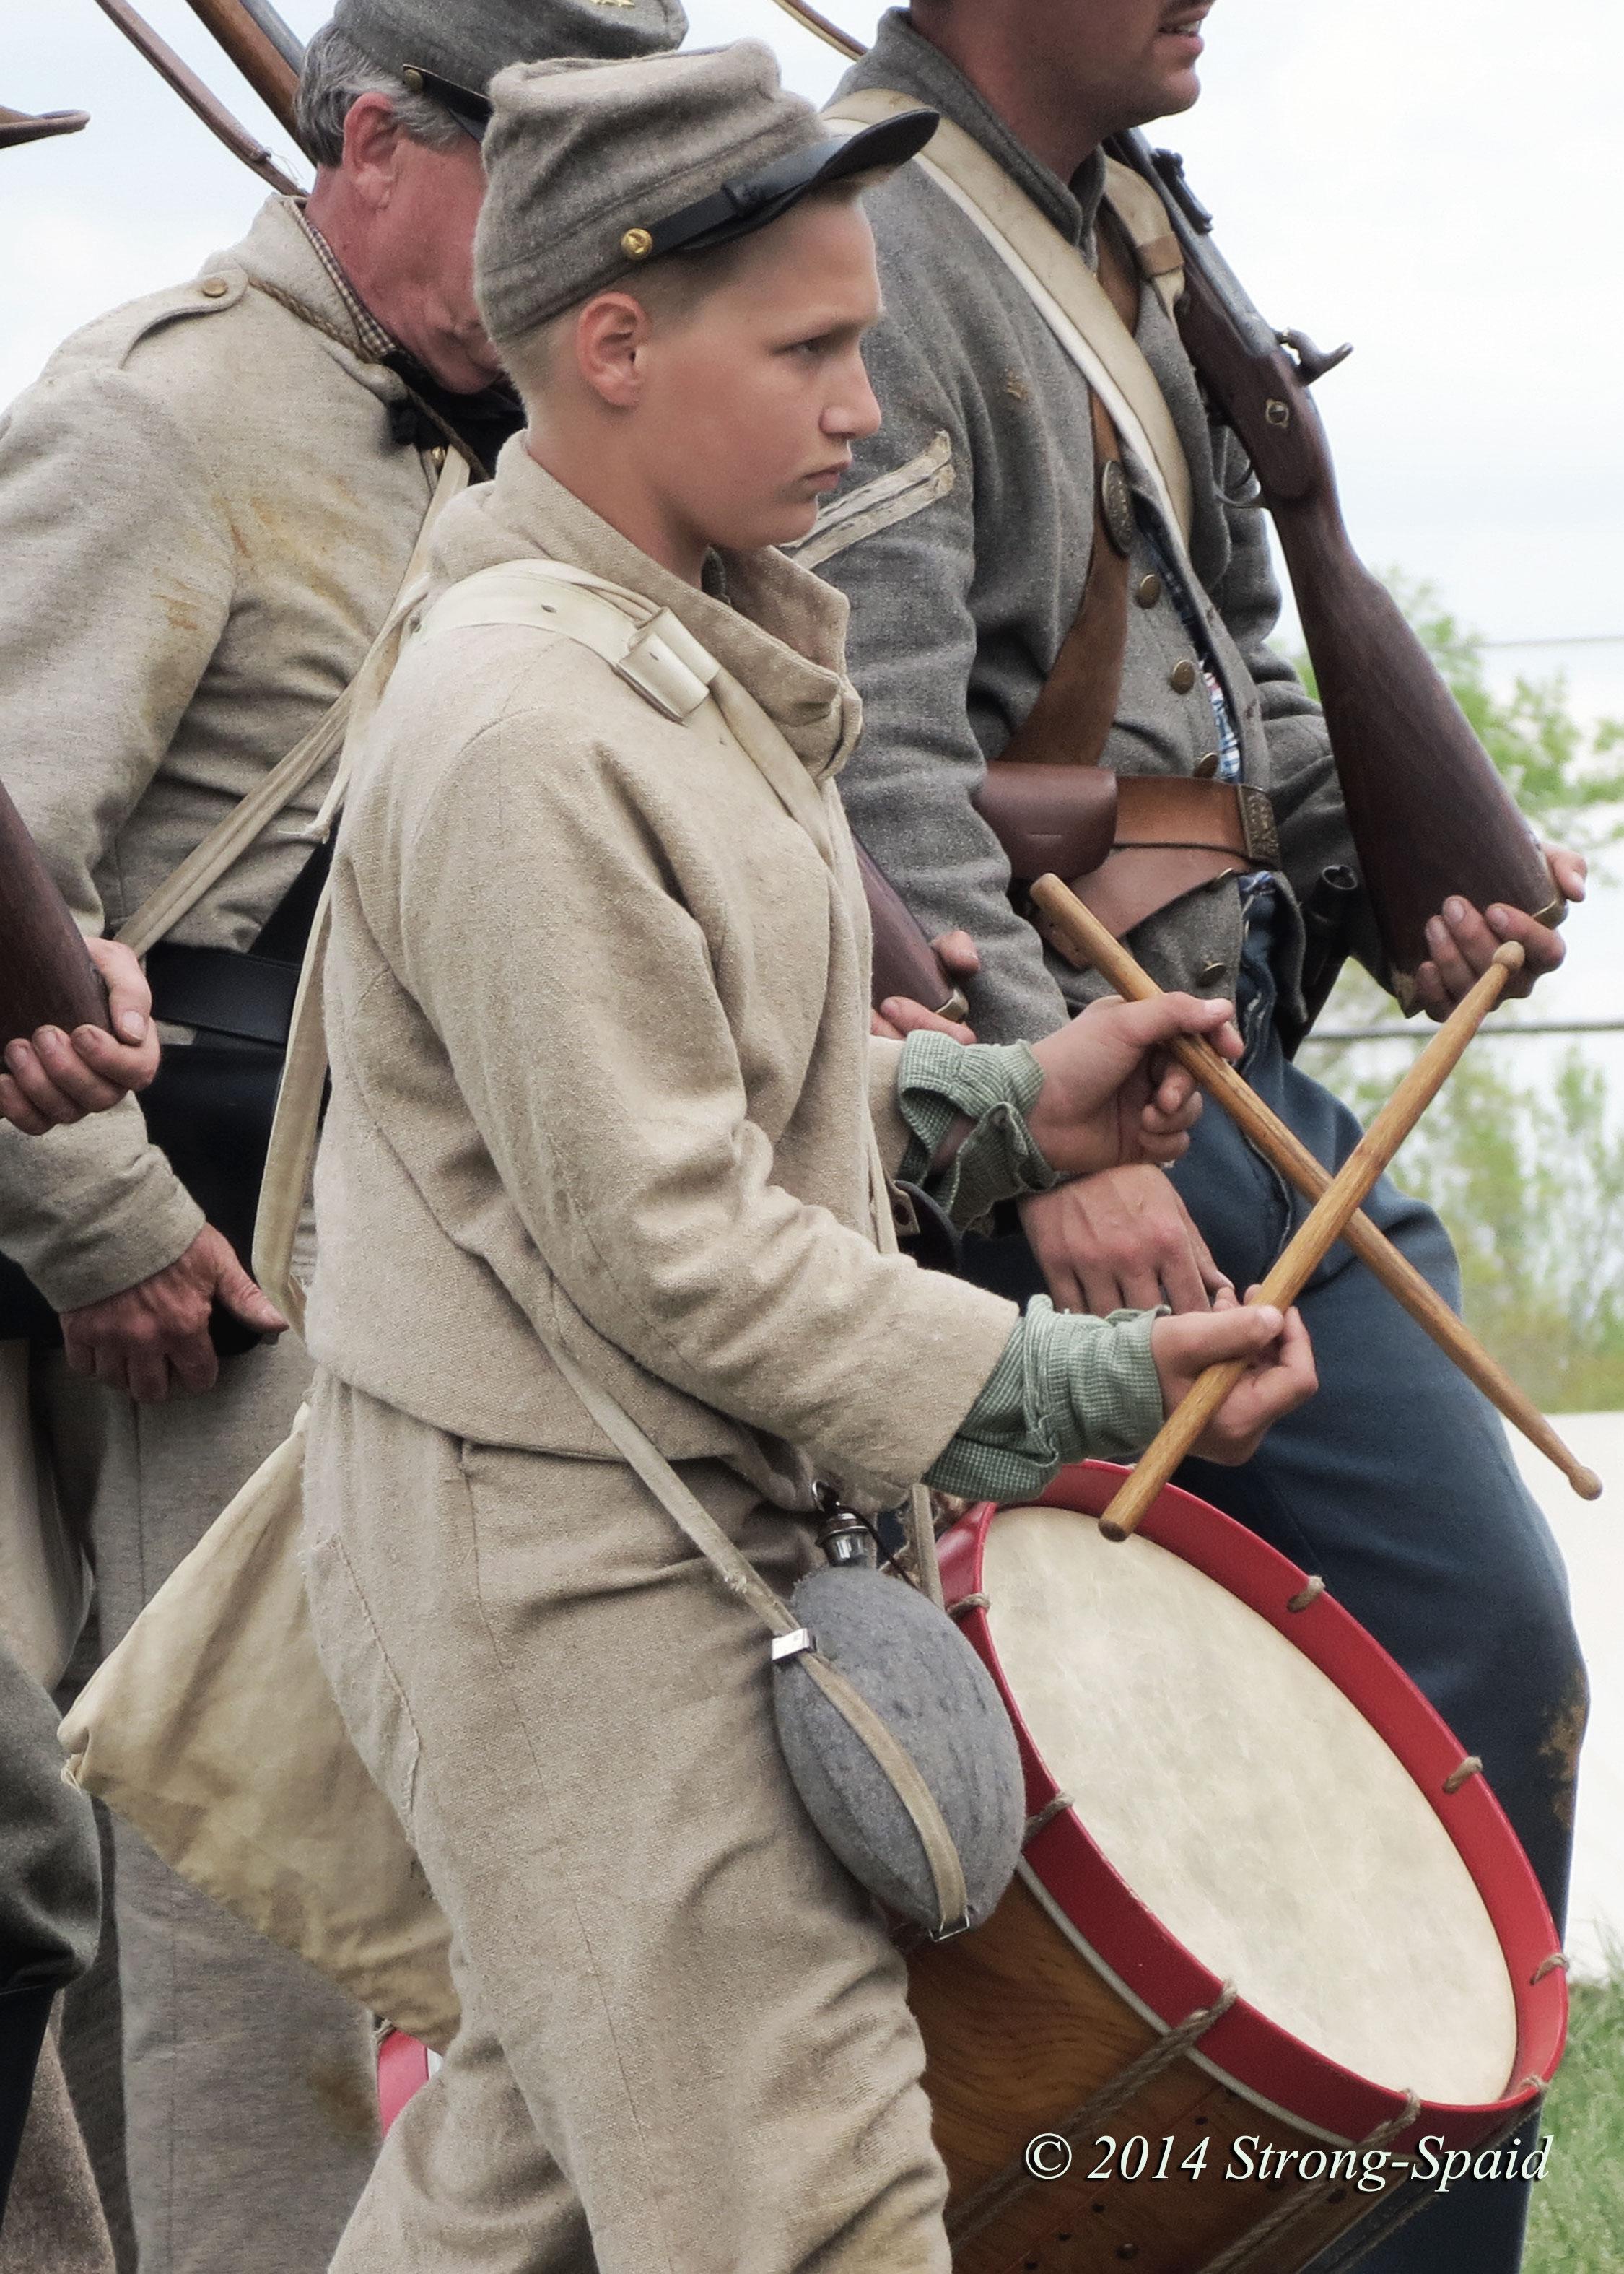 civil war reenactors dating